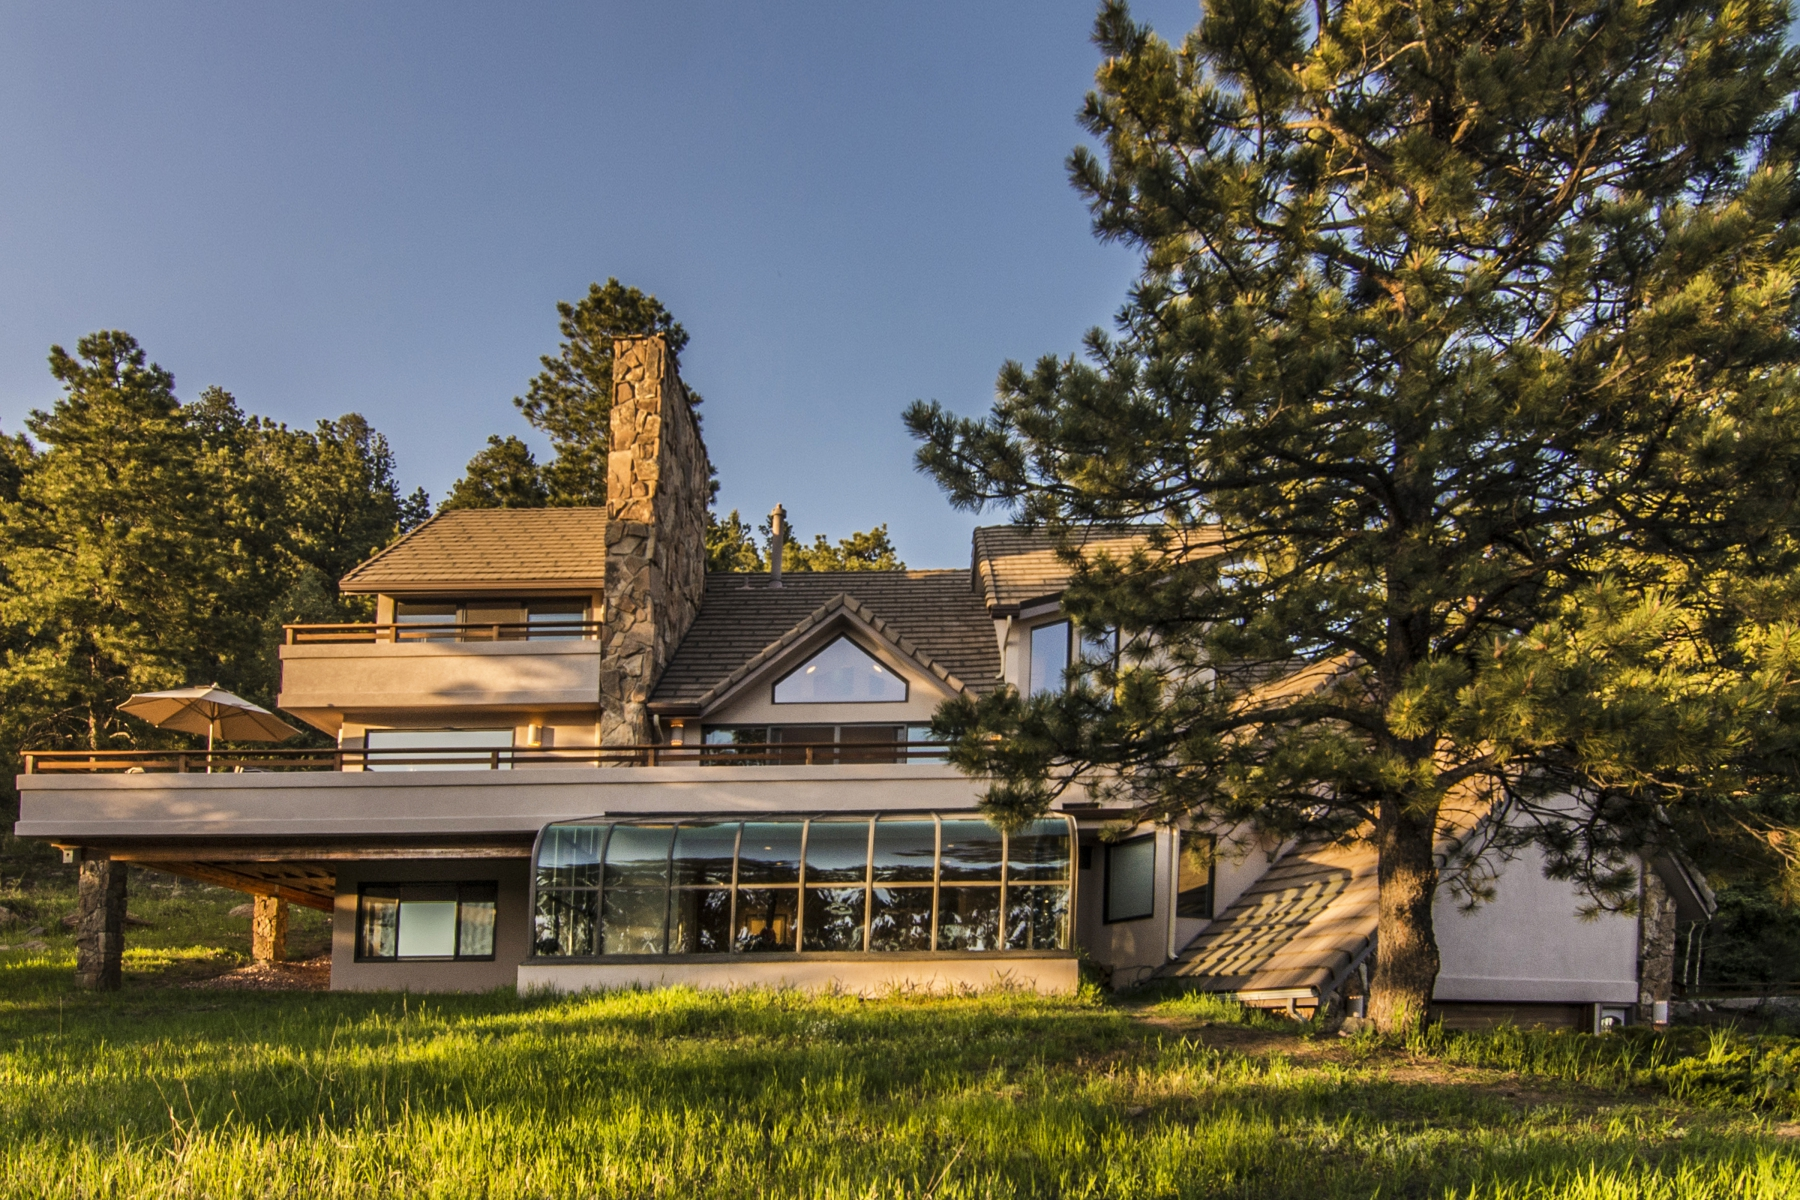 独户住宅 为 销售 在 World-Class Views and Privacy! 1780 Larkspur Drive Golden, 科罗拉多州 80401 美国